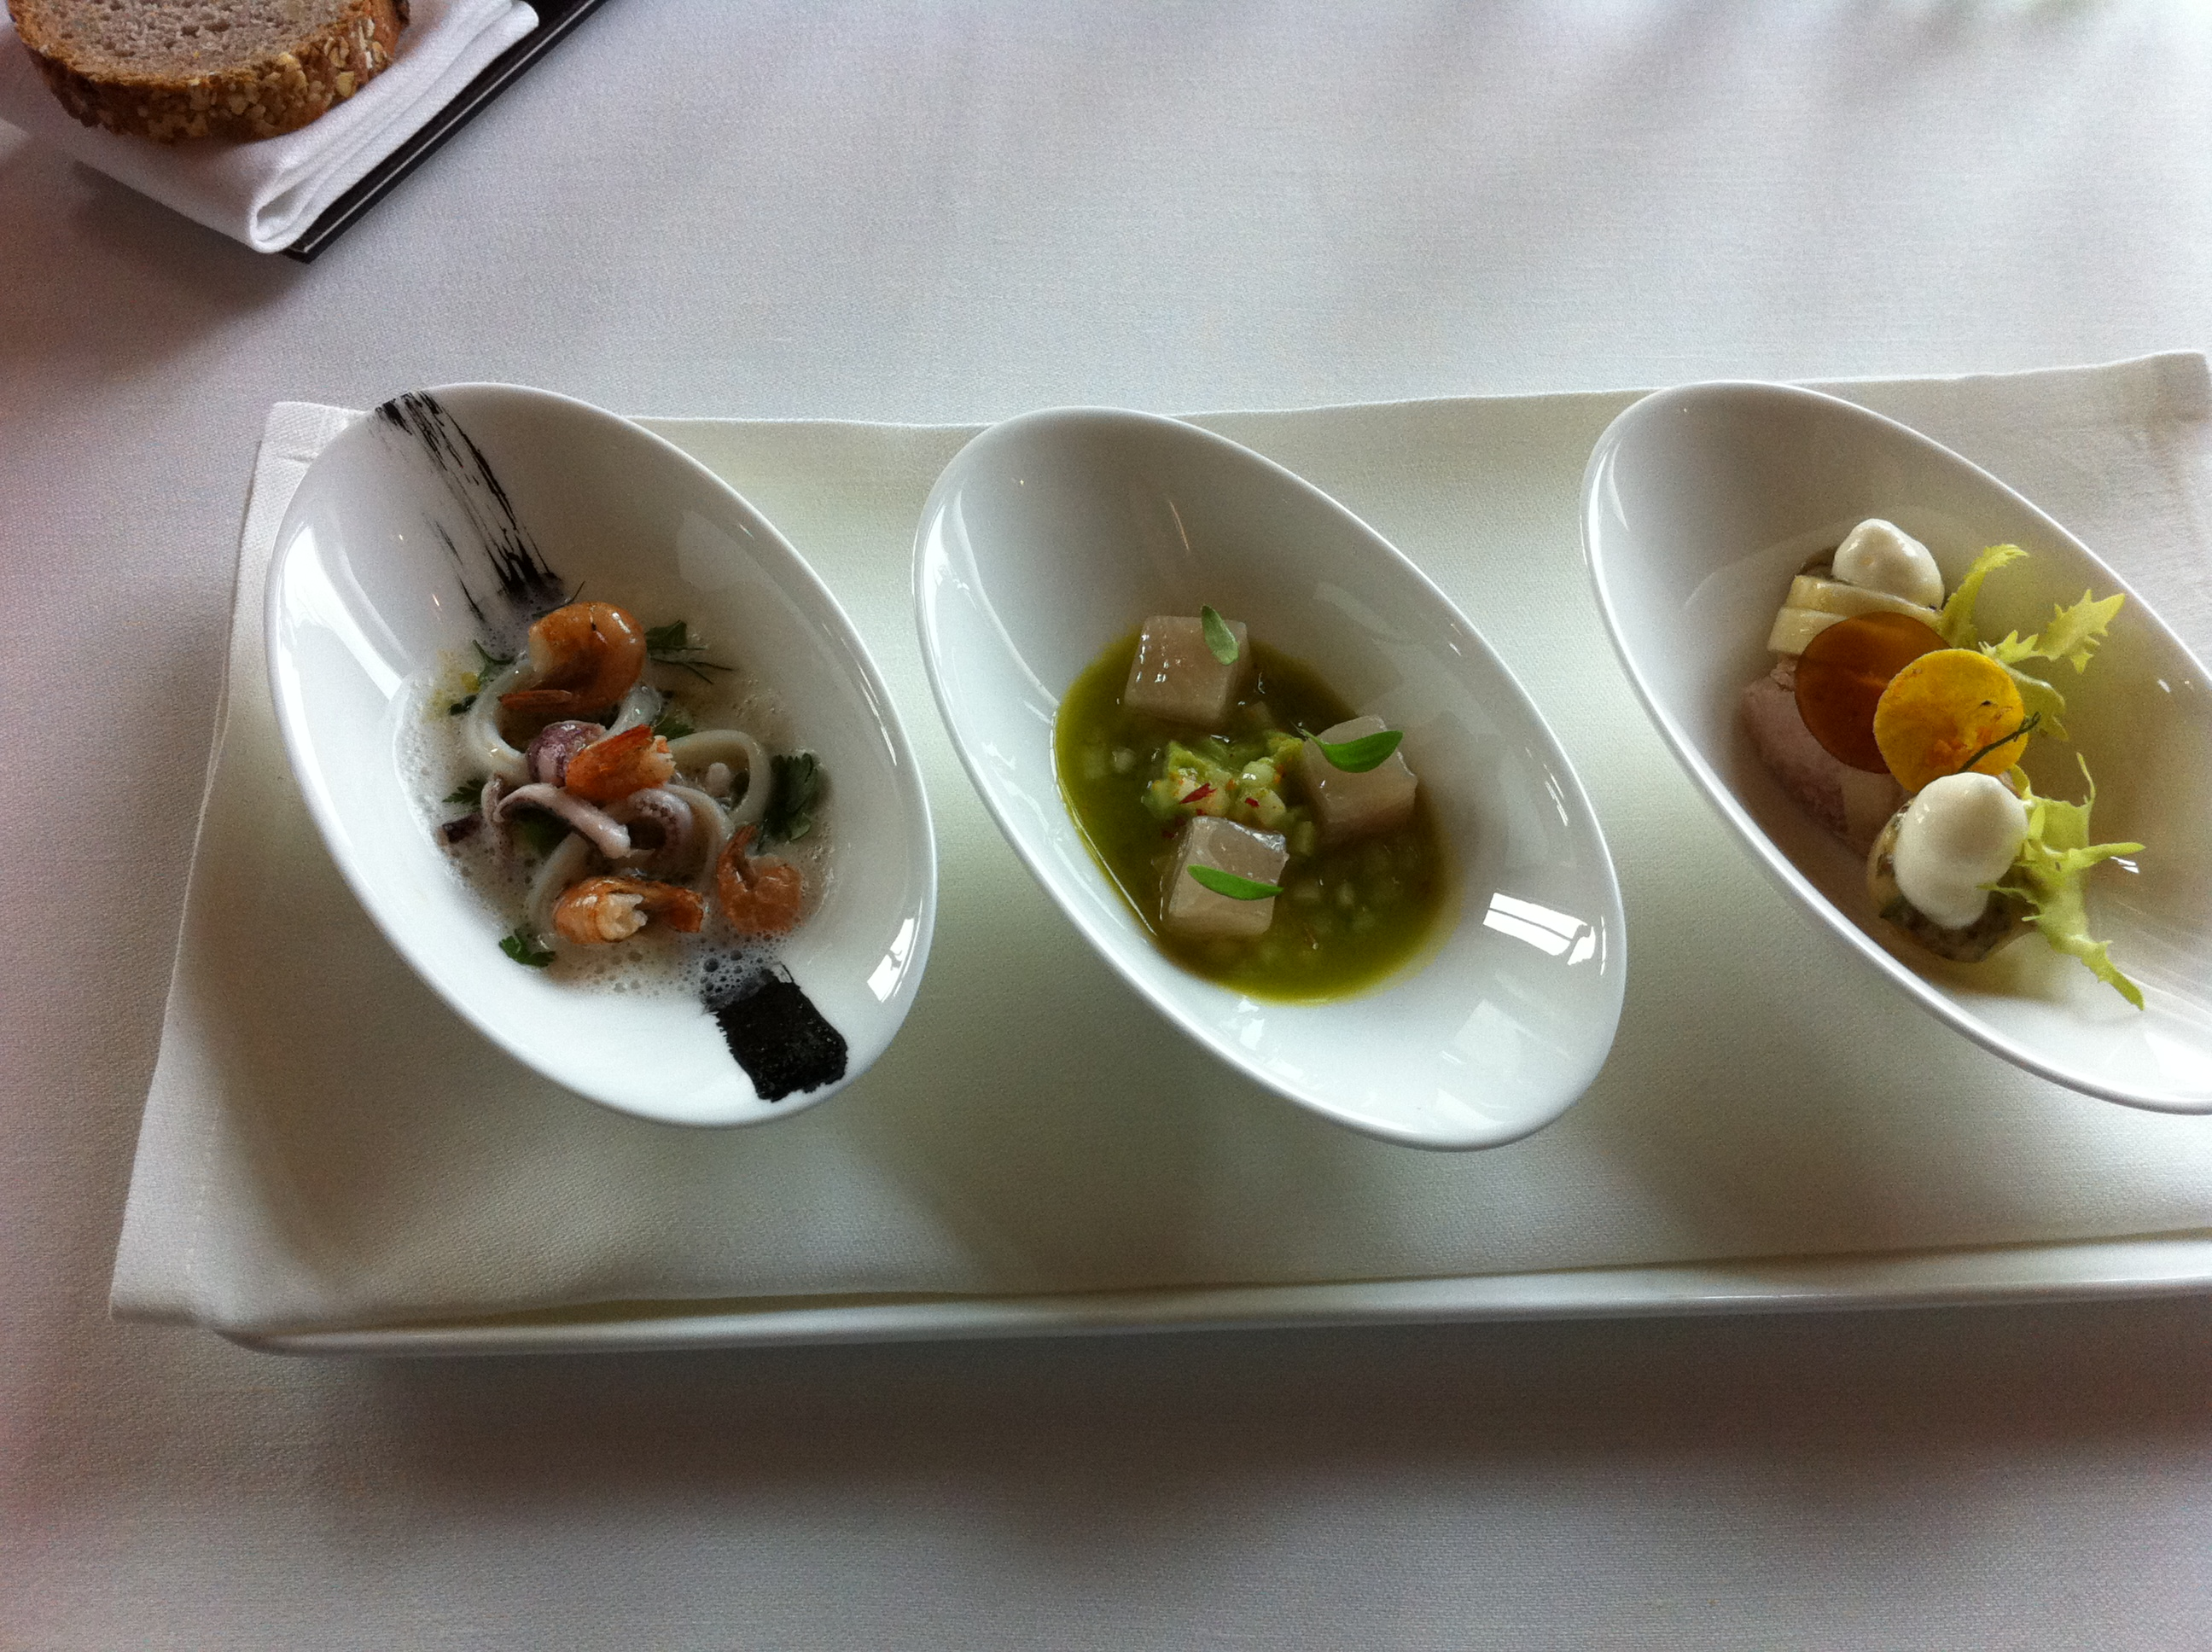 The restaurant grand hotel dolder zurich lunch the for Amuse bouche cuisine